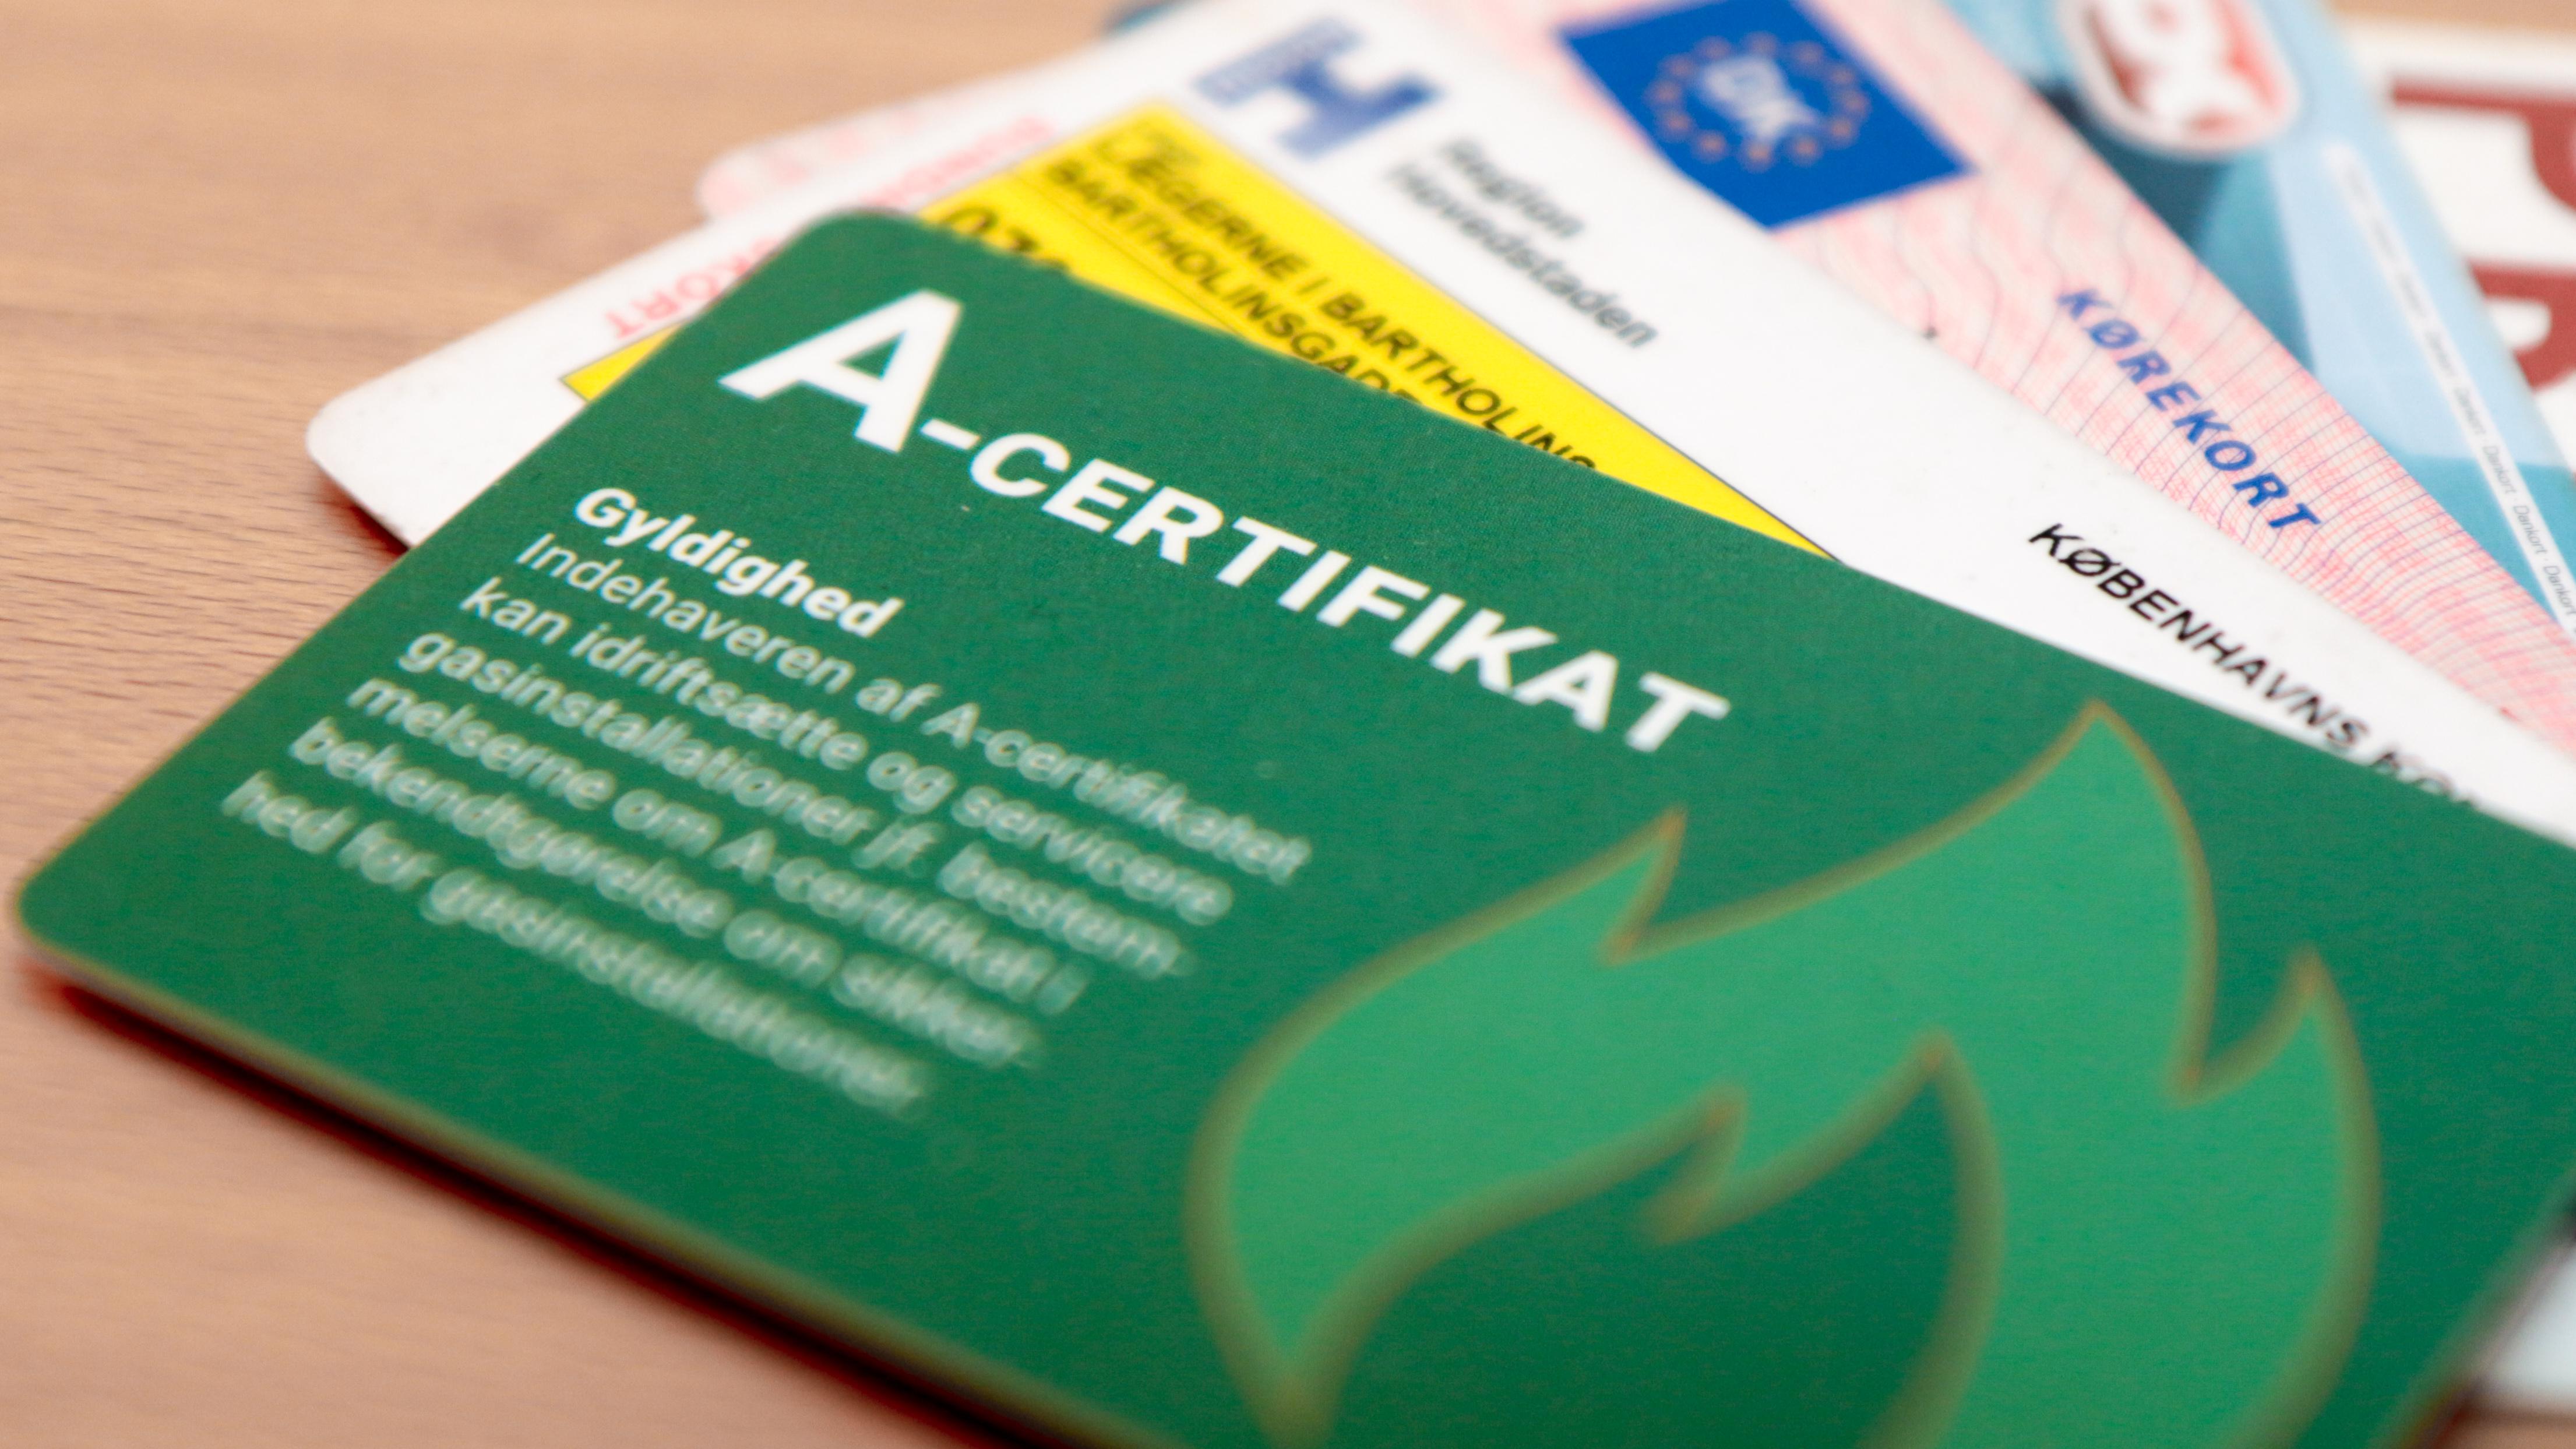 A-certifikatsekretariatet